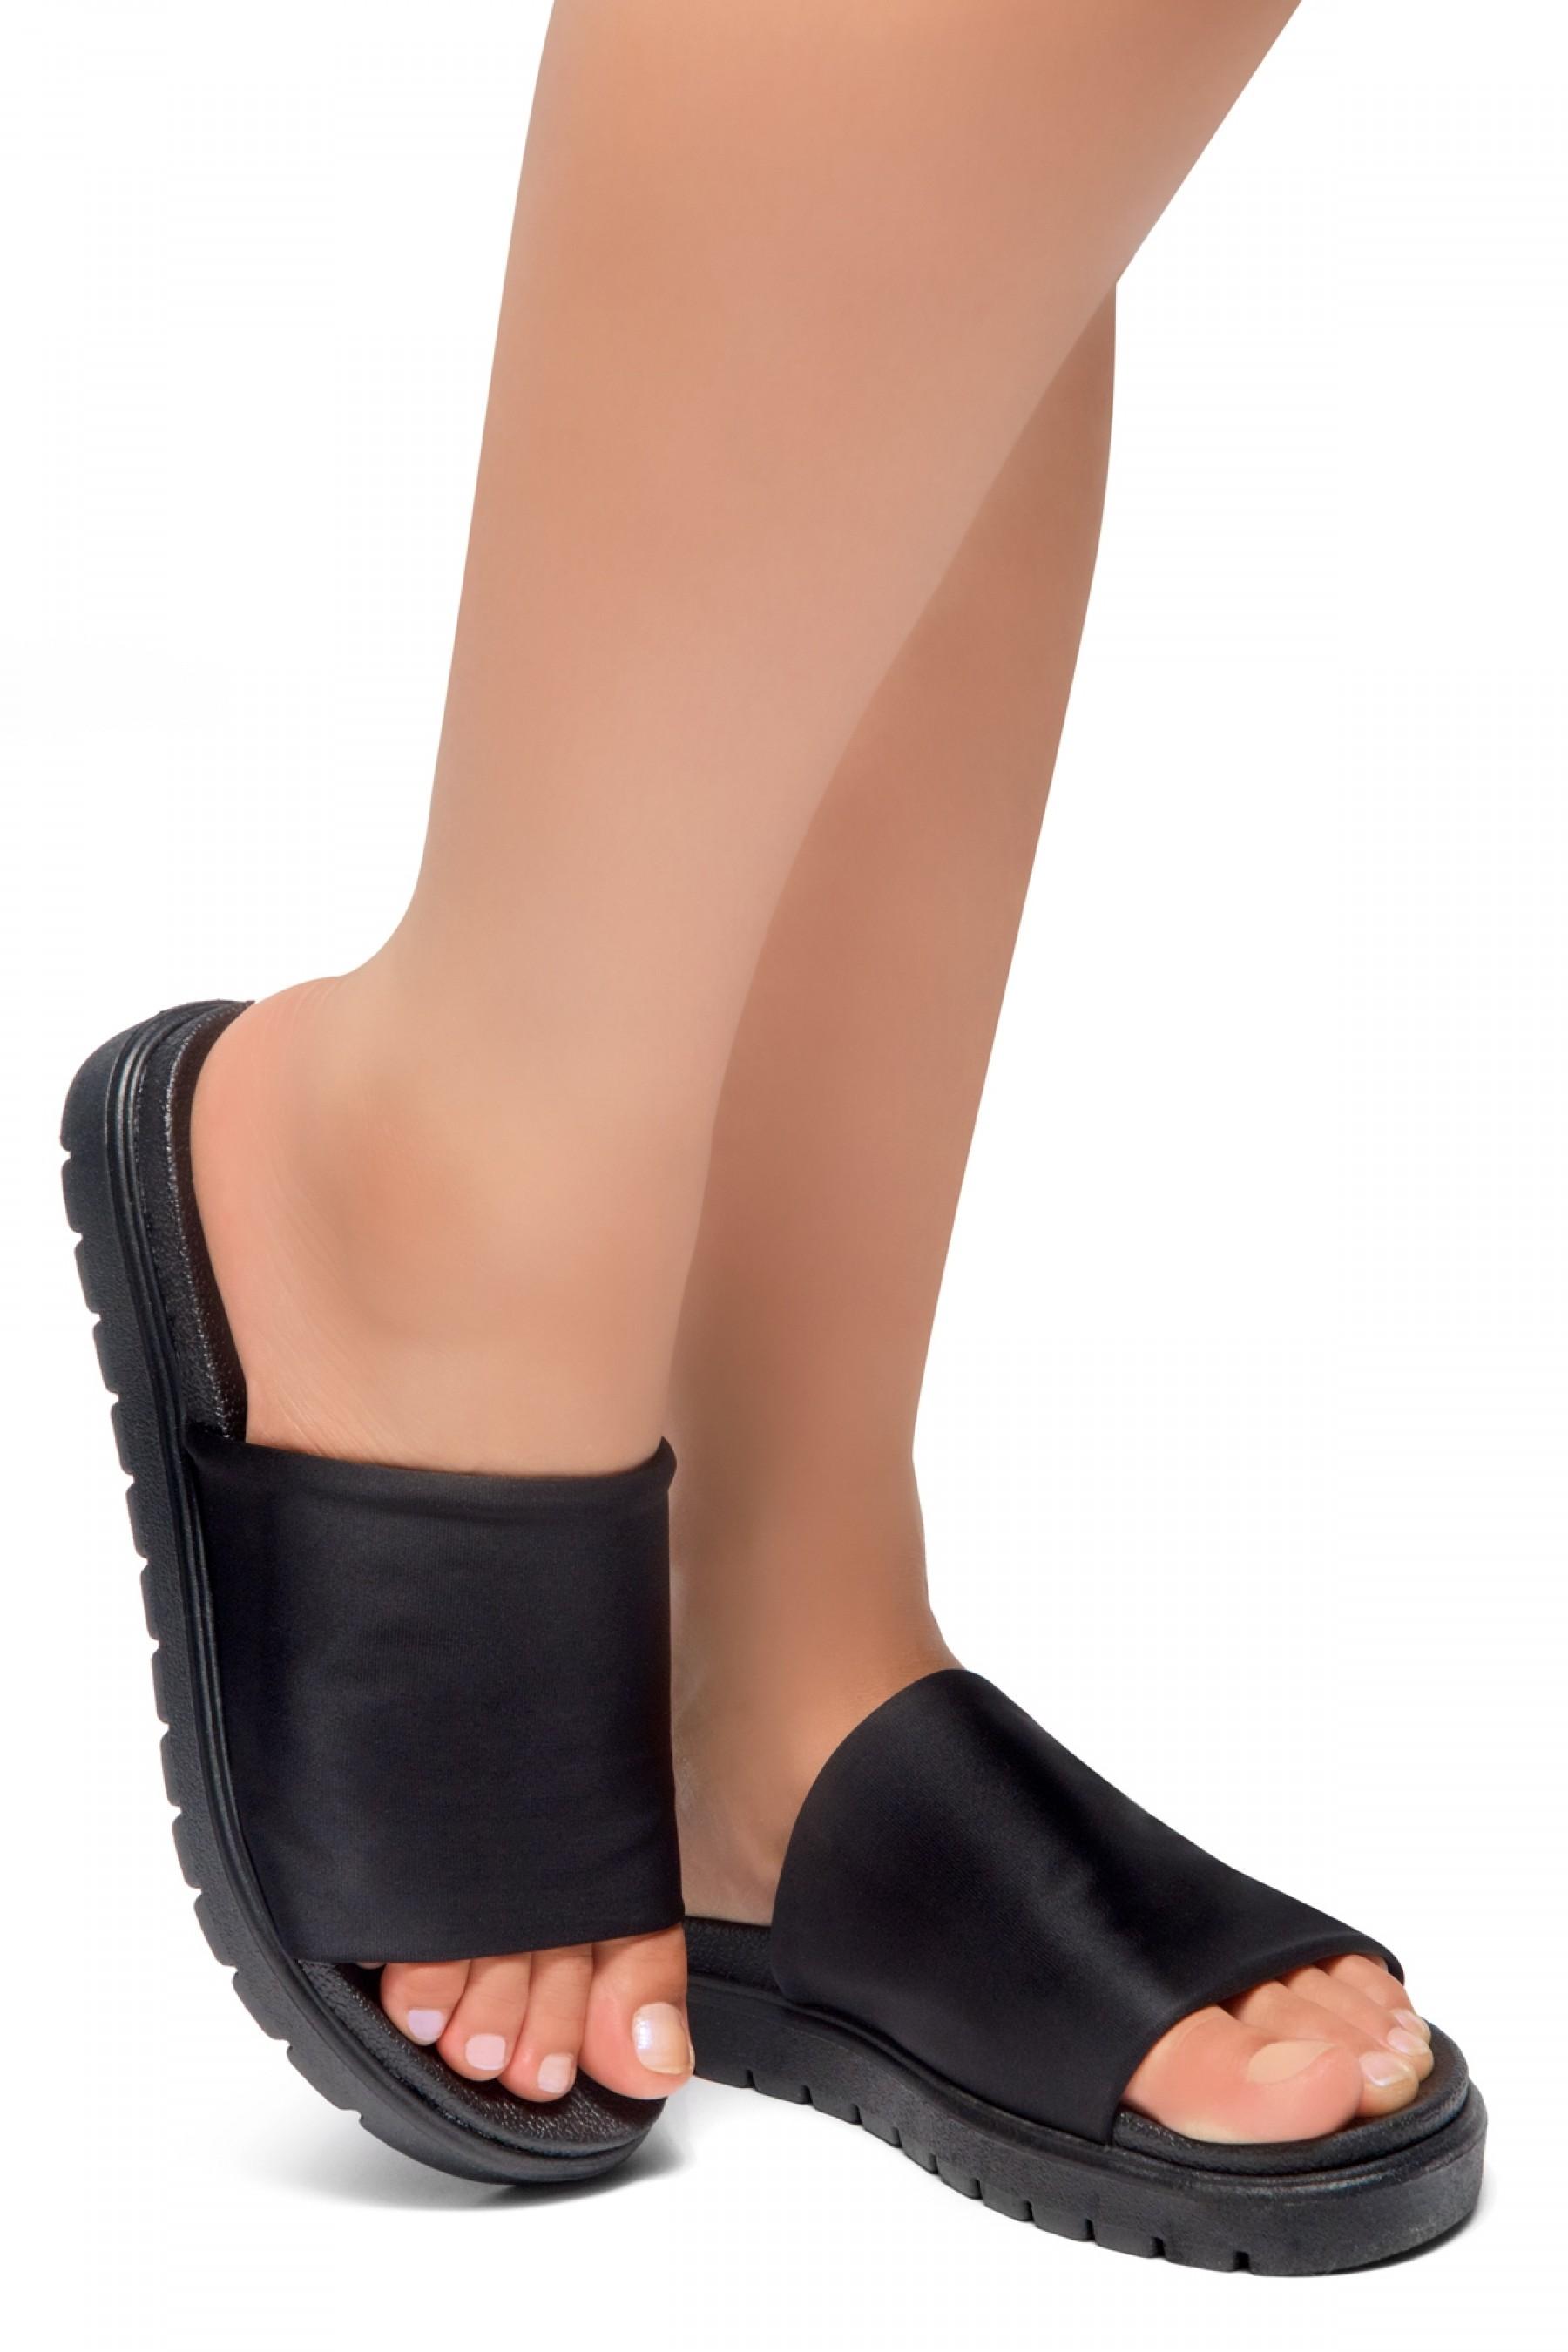 HerStyle Knock Comfort-Open Toe Slide Sandals (BlackBlack)